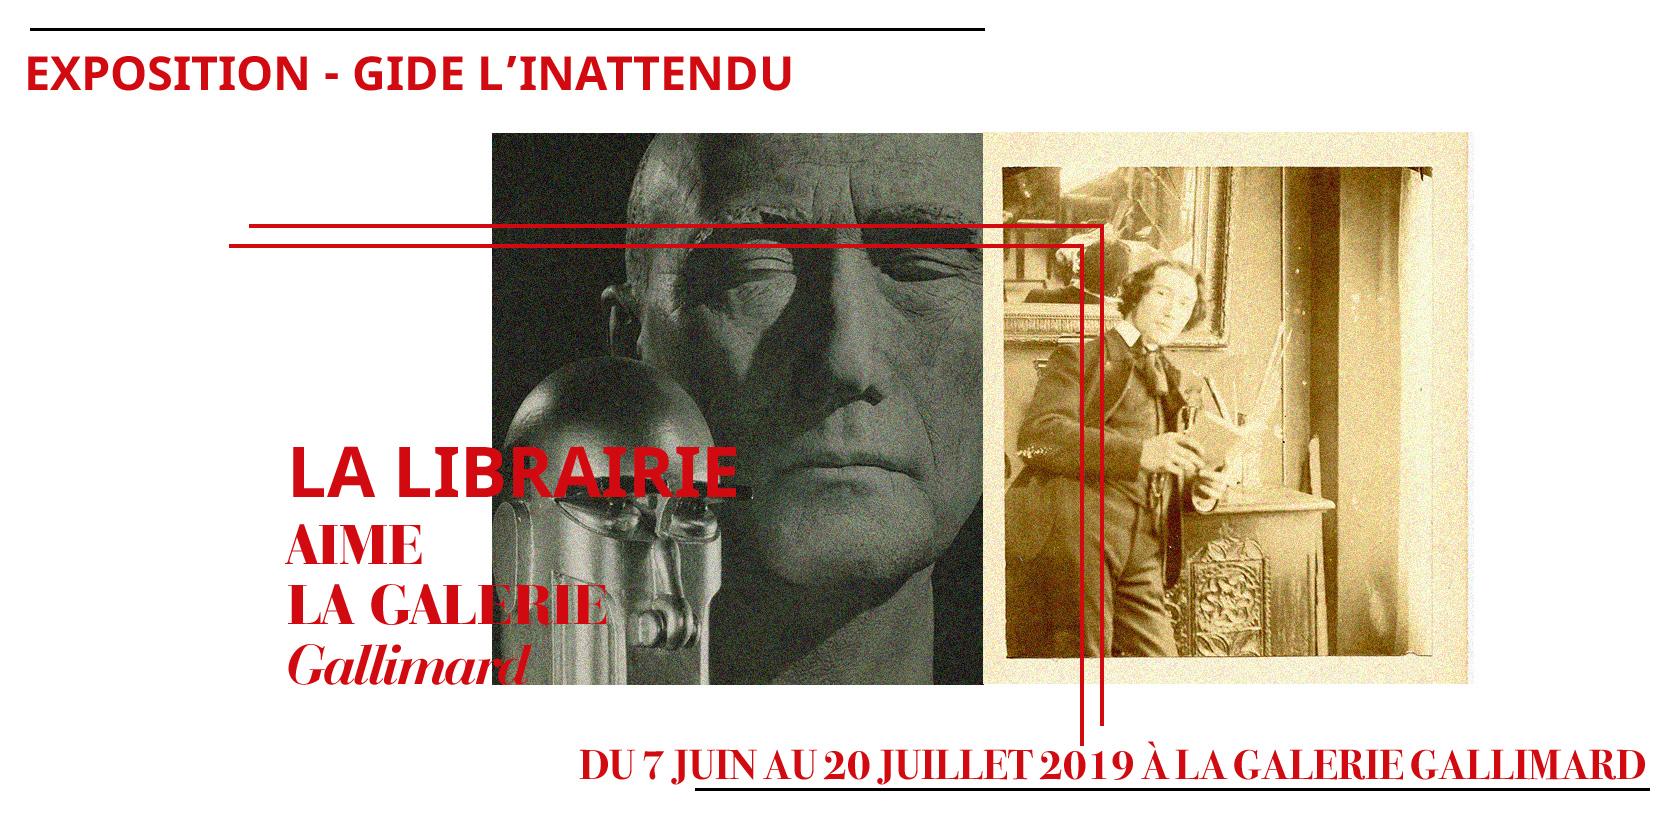 Exposition à la Galerie Gallimard-Gide l'inattendu